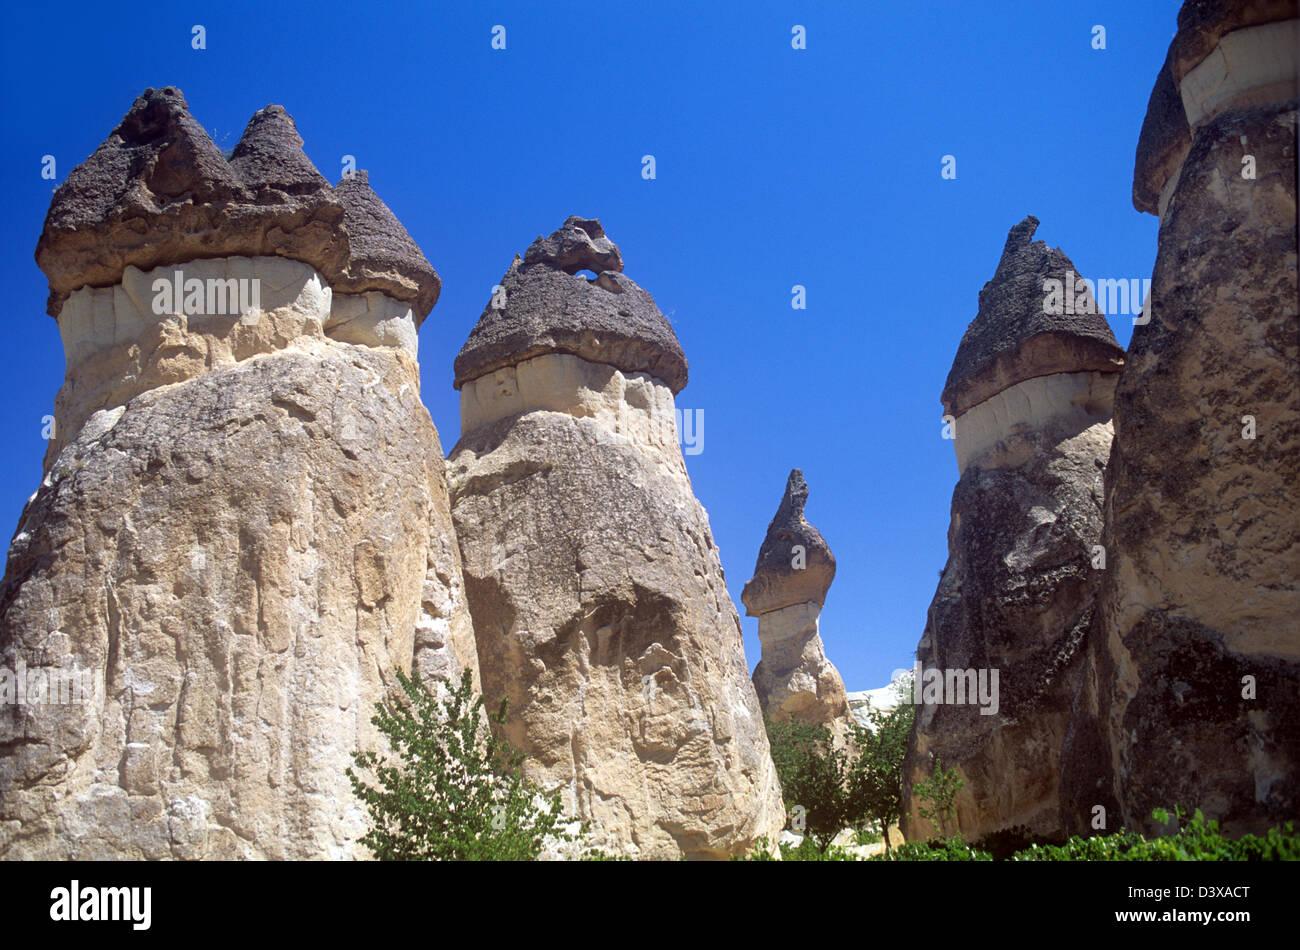 Unusual natural stone formations in Cappadocia, Turkey - Stock Image